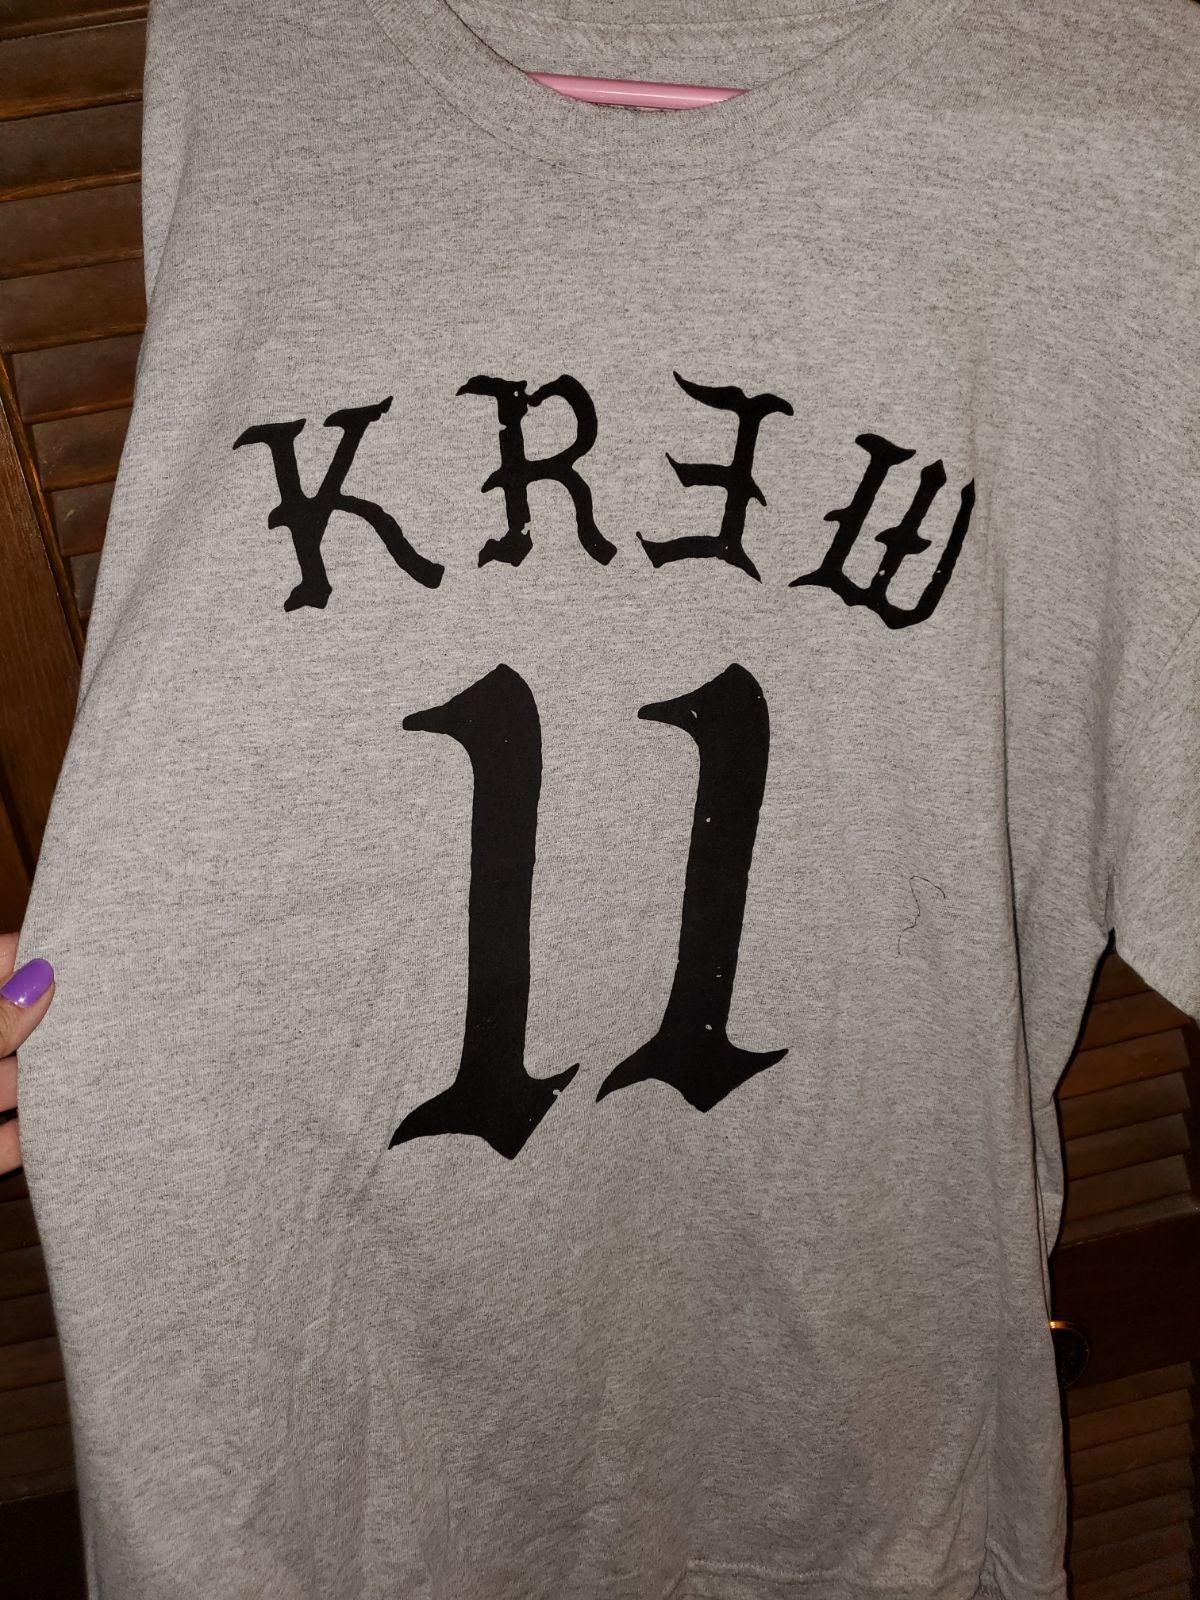 Brand New Krew Tshirt